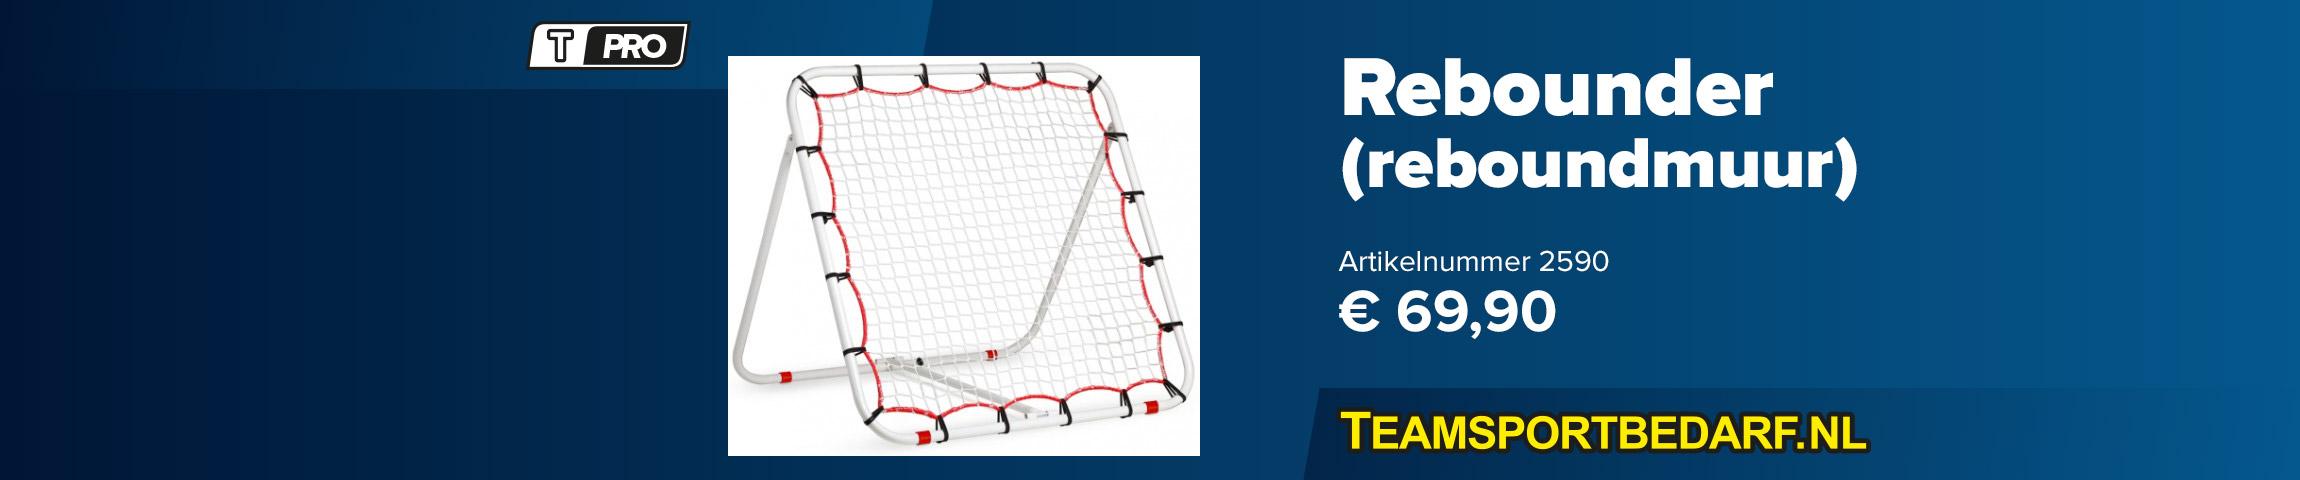 Rebounder - 88 x 88 cm